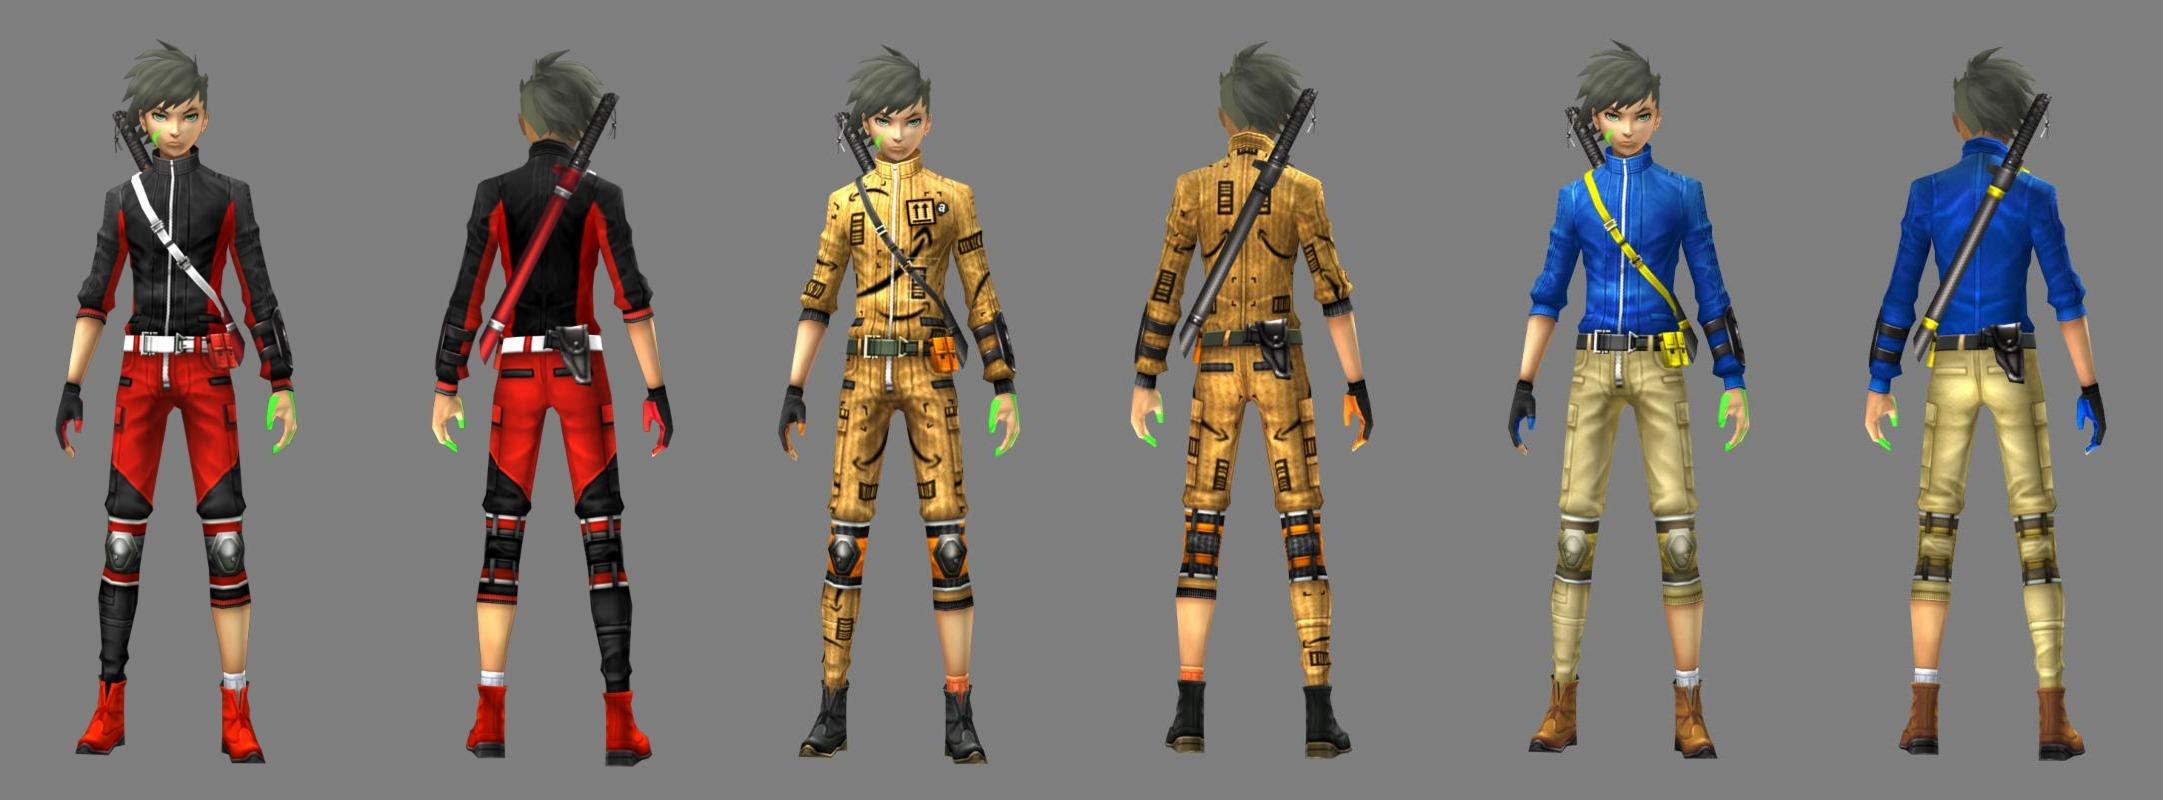 shin-megami-tensei-iv-apoc-costumes